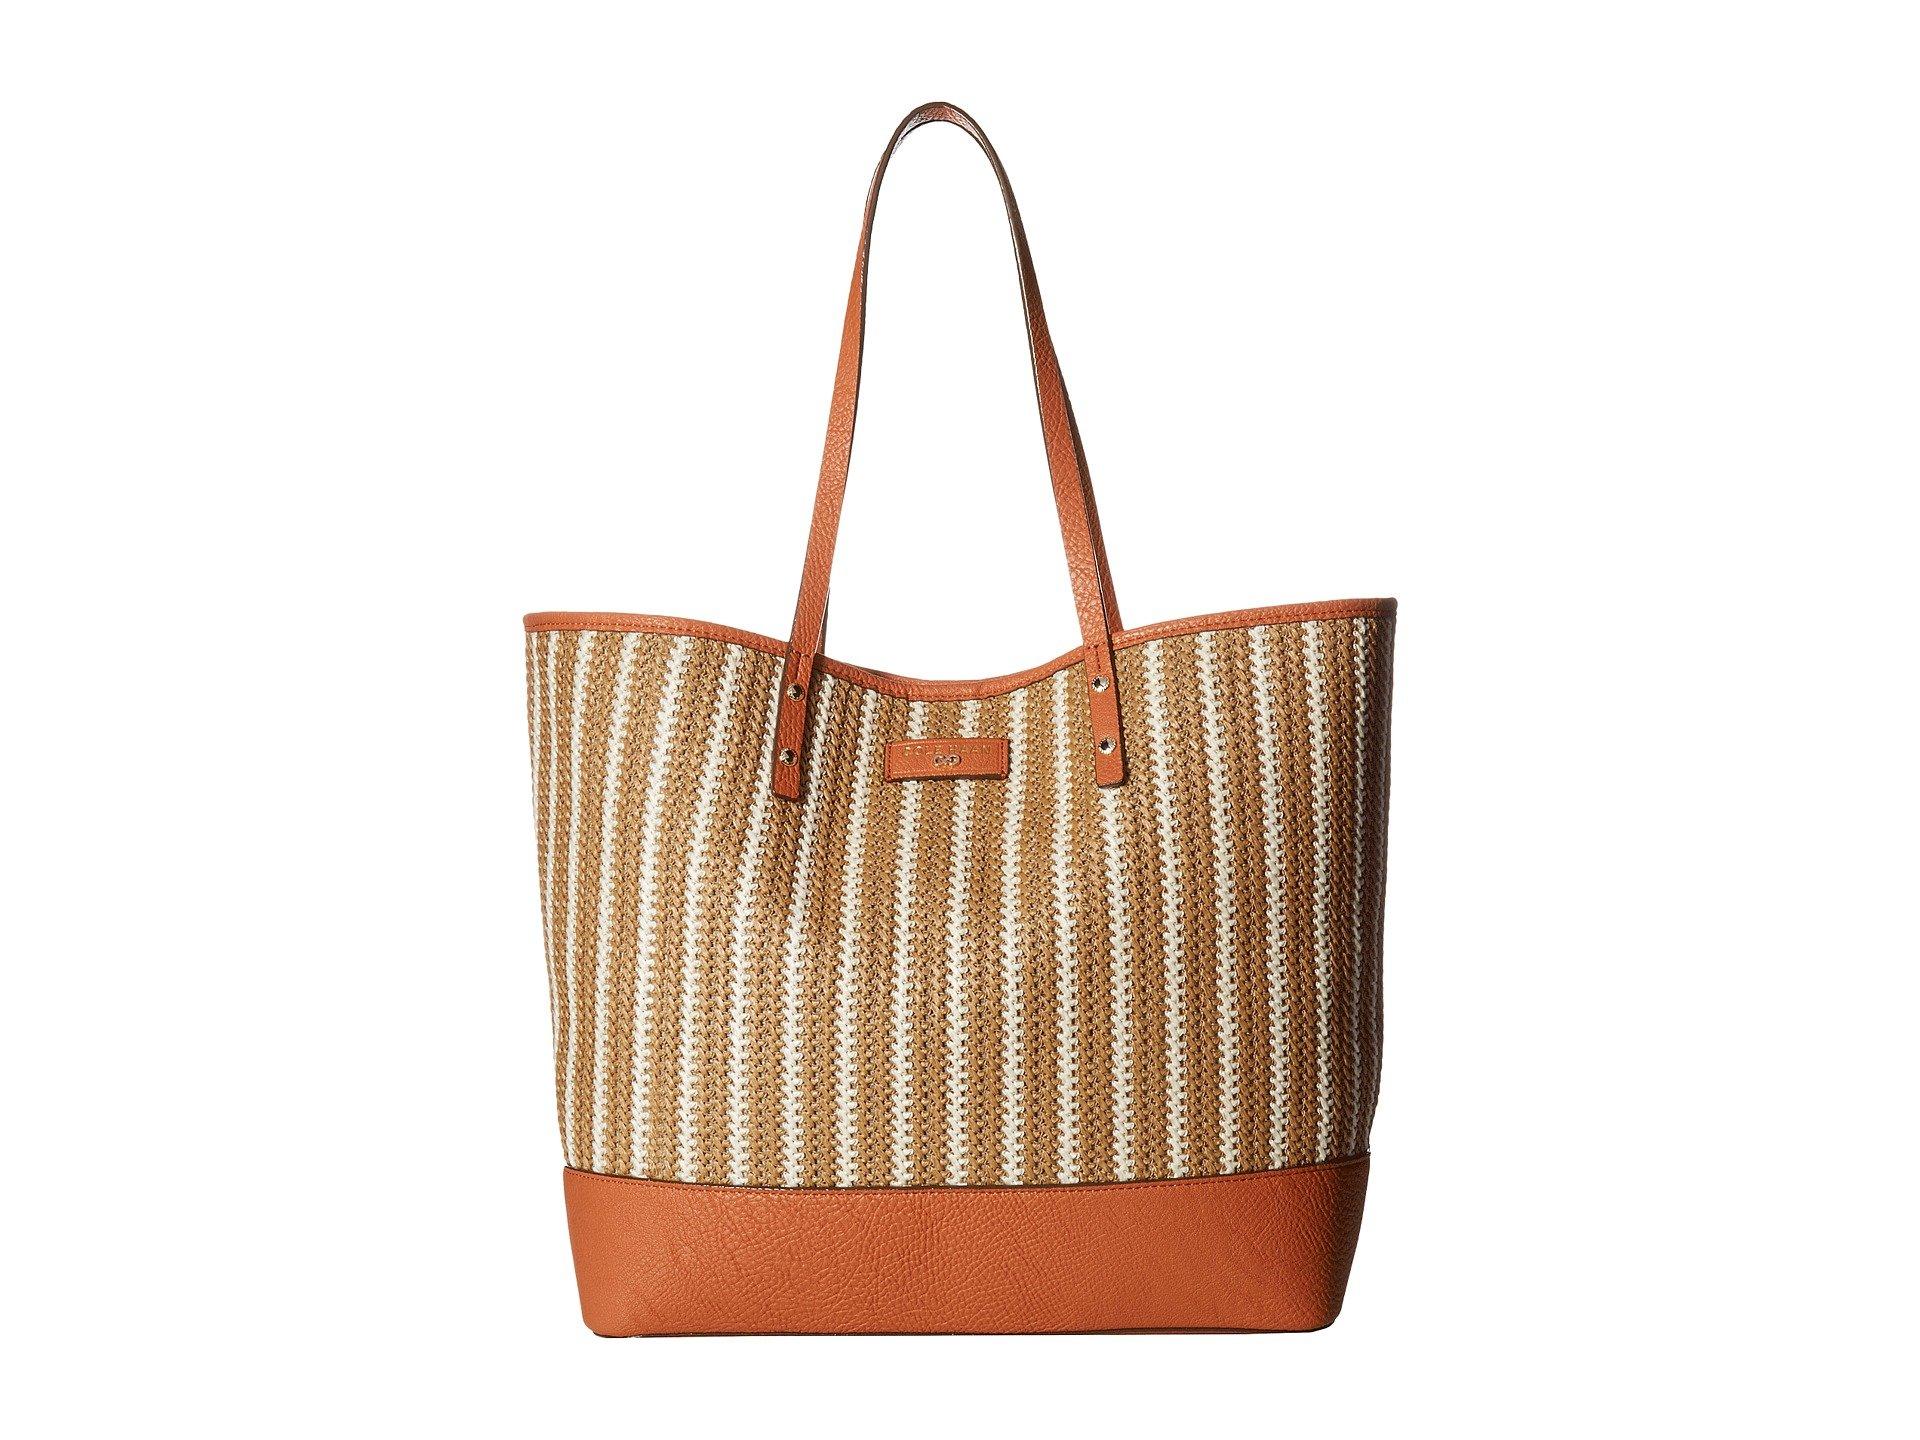 Cole Haan Women's Beckett Tote Natural/Ivory Skinny Stripe Handbag